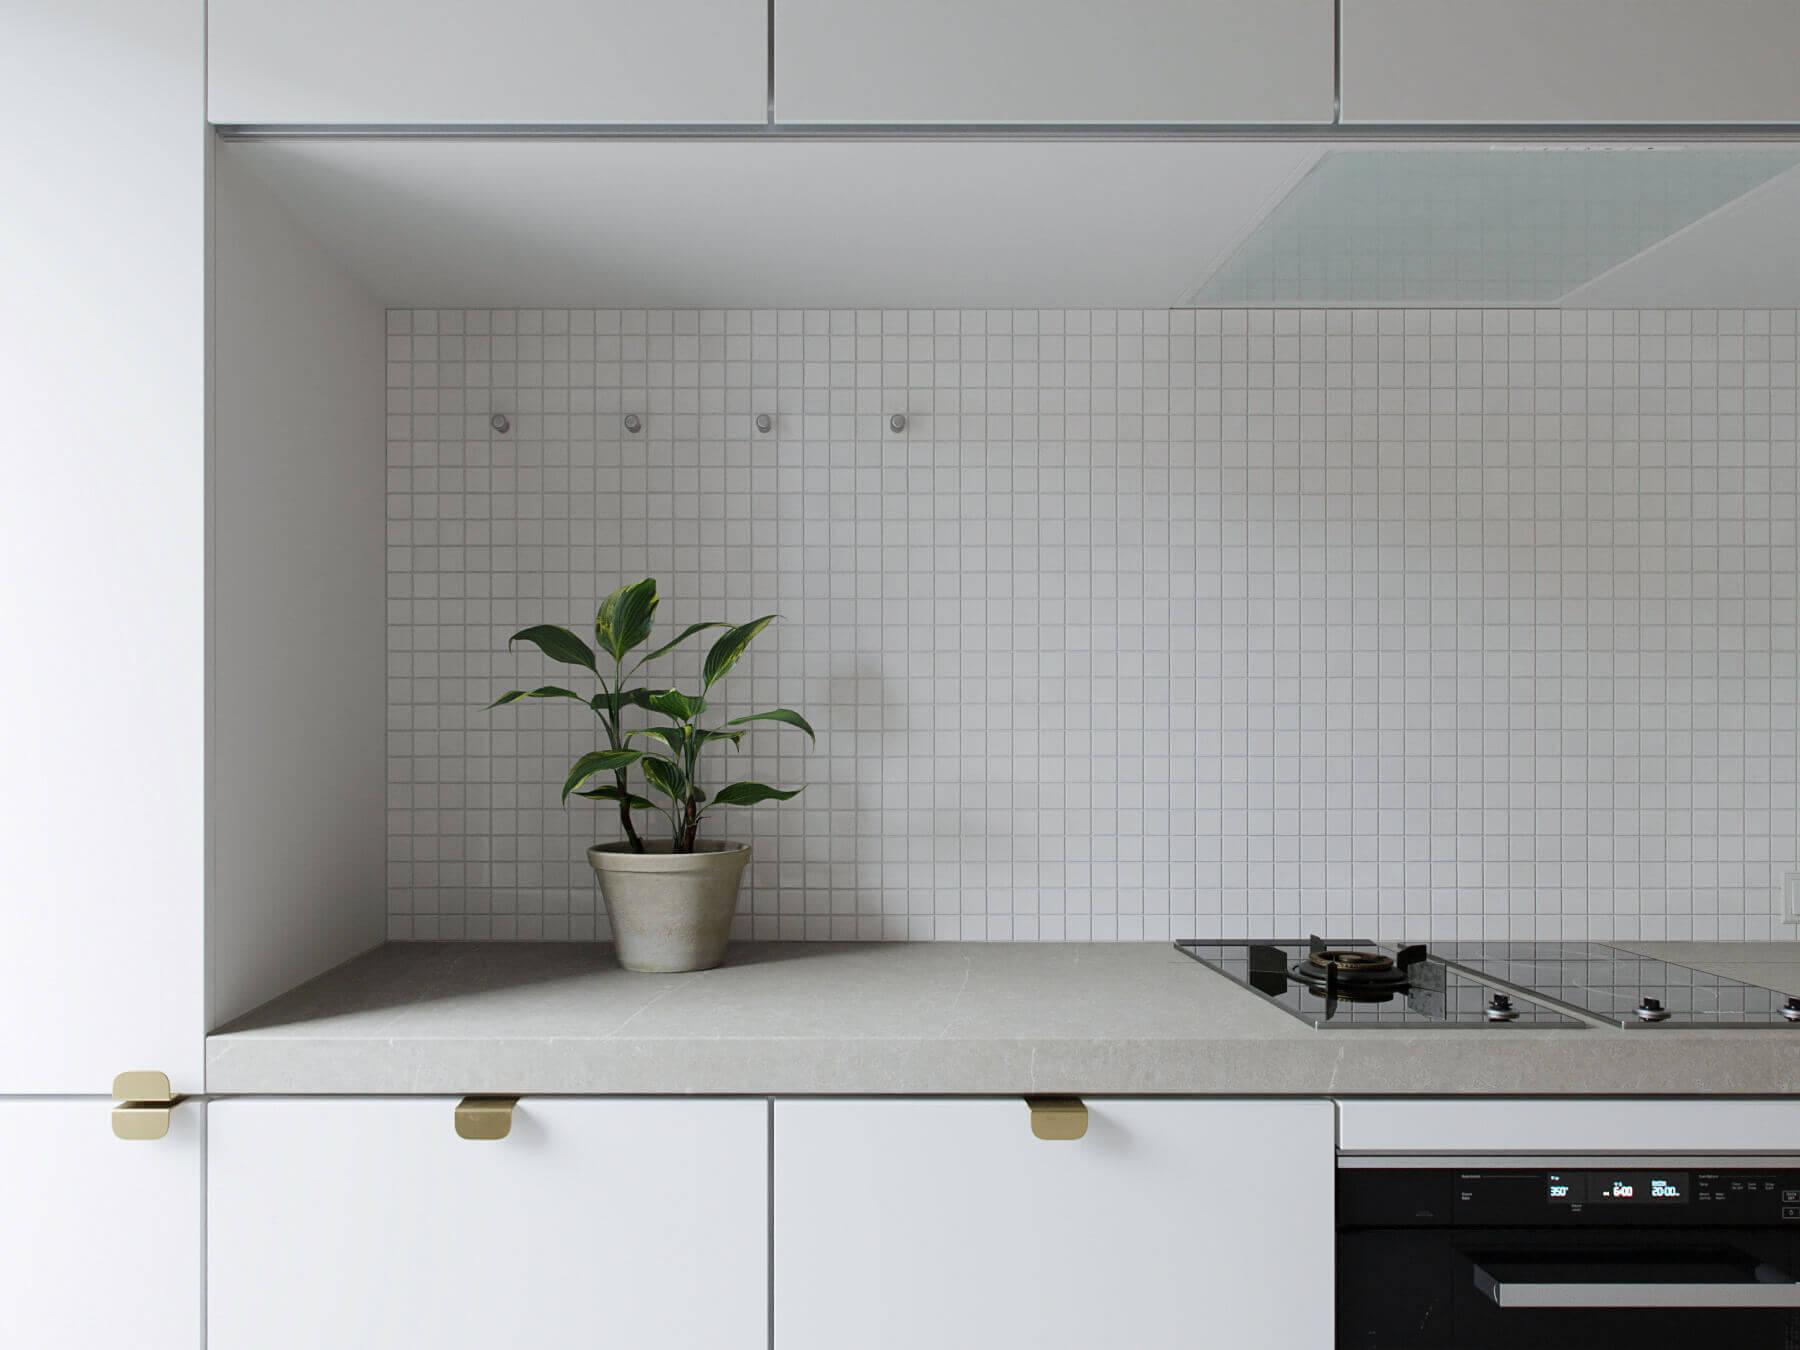 Trendy Living & Kitchen apartment stone top kitchen block - cgi visualization